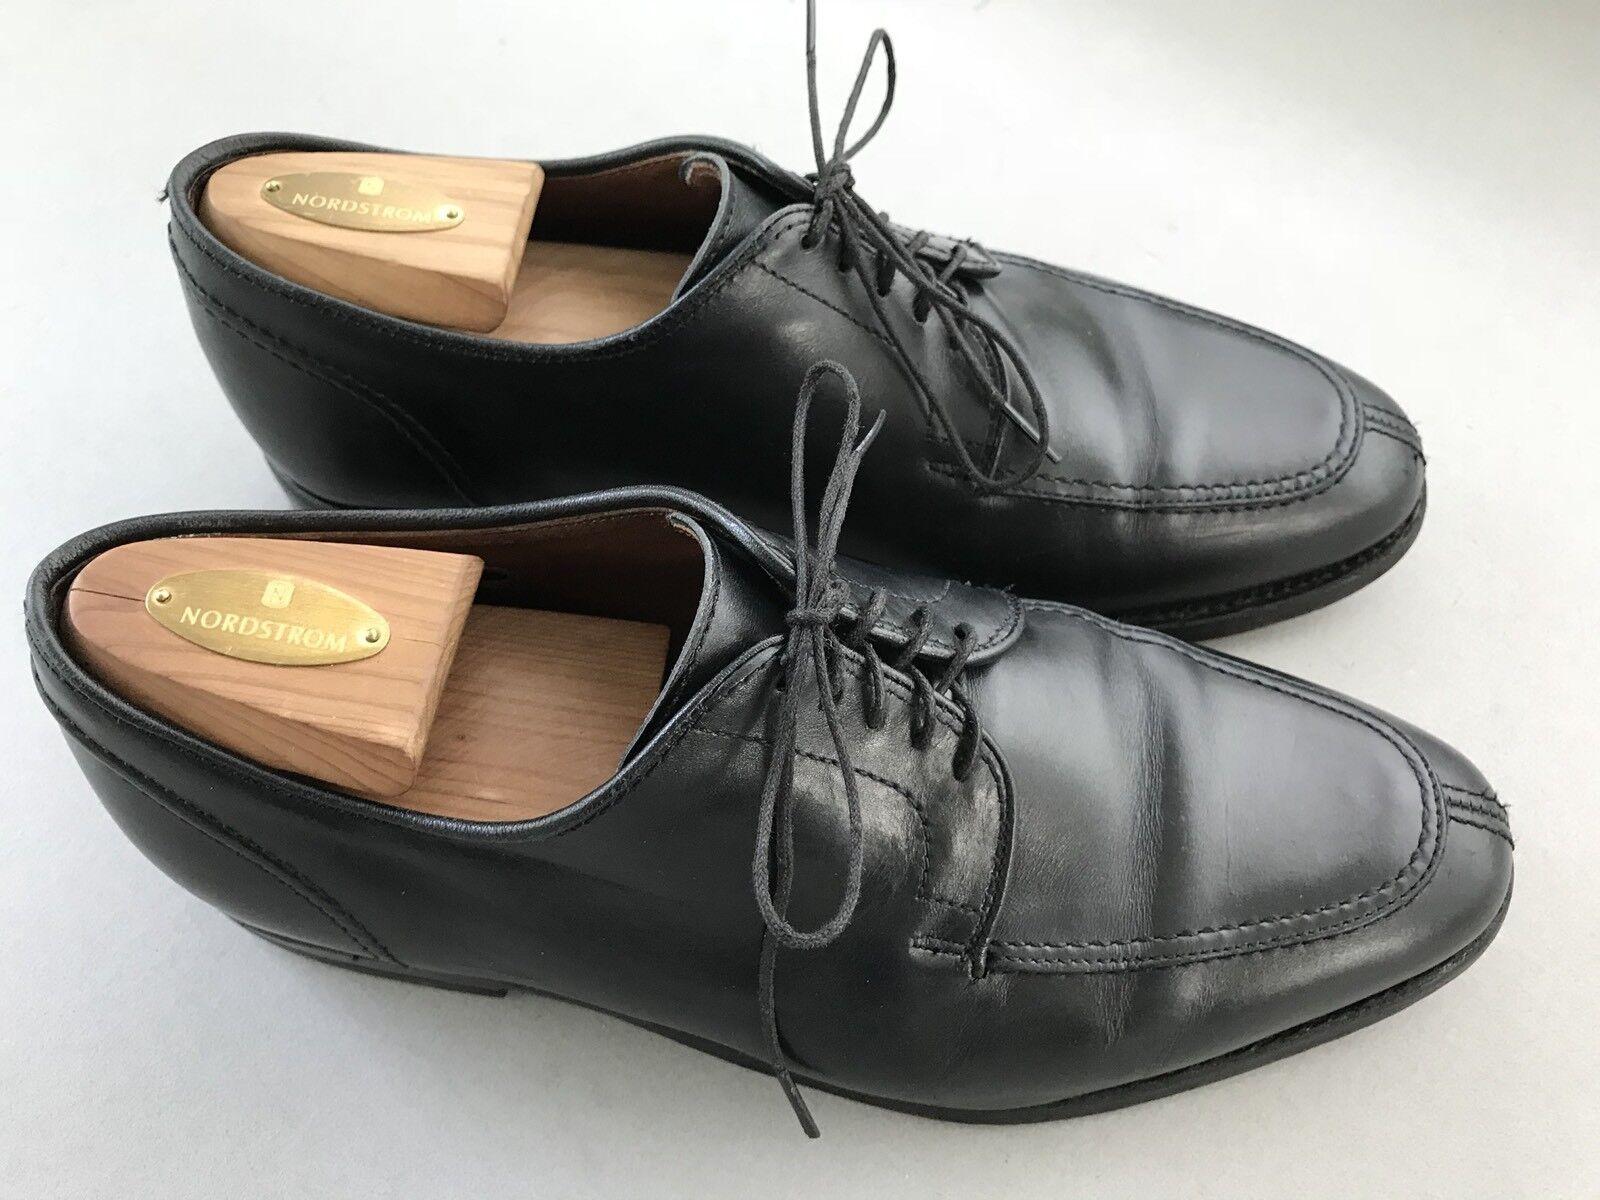 Allen Edmonds Lasalle Split Toe Lace Up Black Dress shoes Size 8.5 EEE Wide